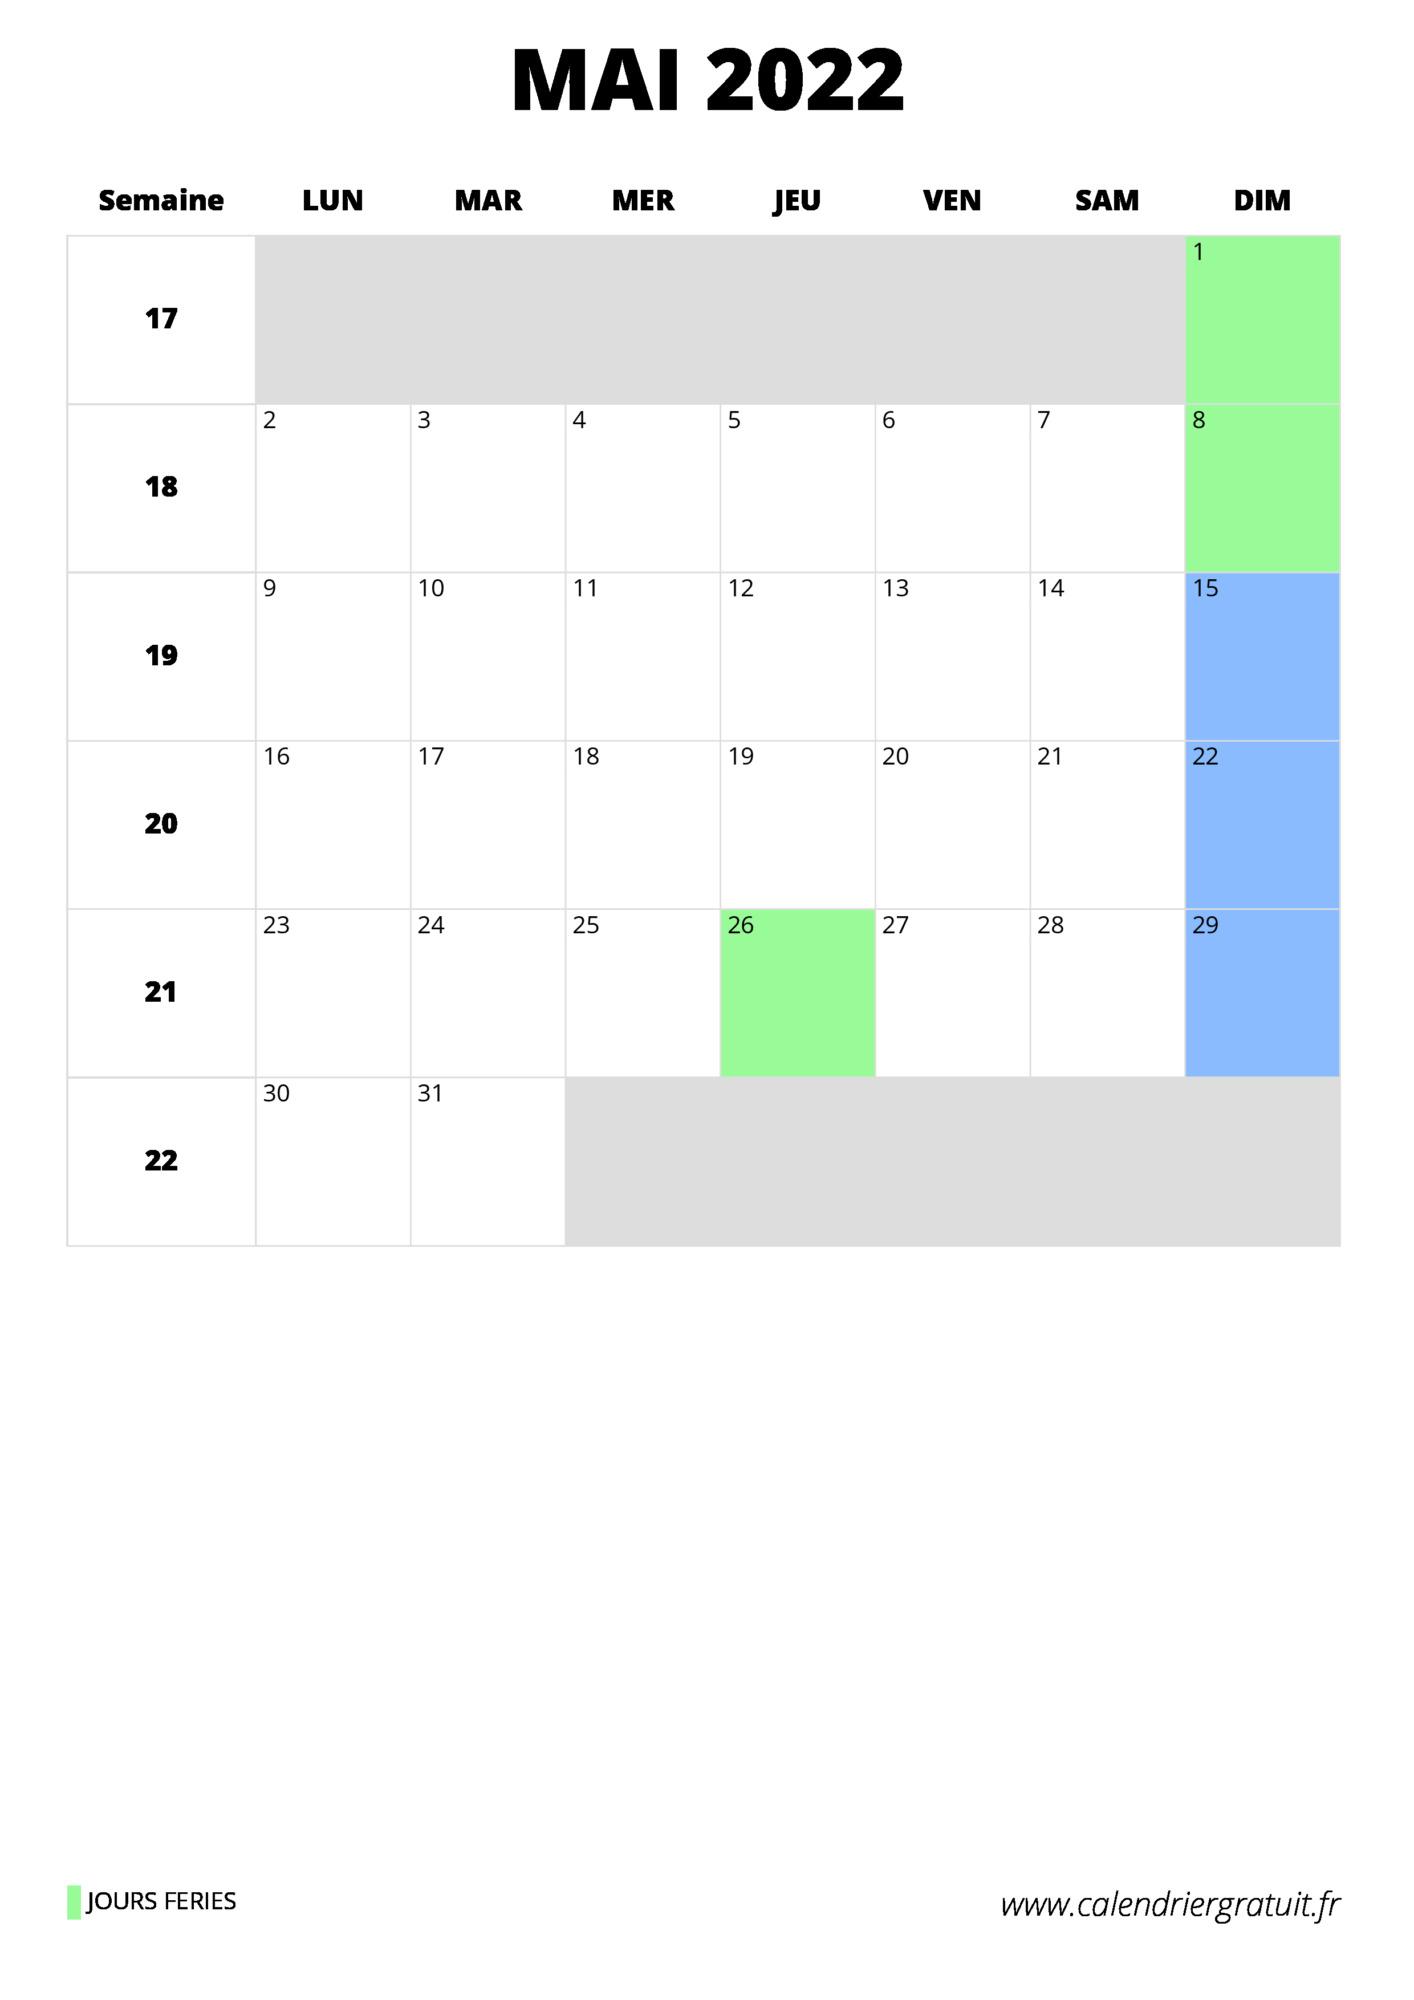 Calendrier Mai 2022 Jours Fériés calendrier mai 2022